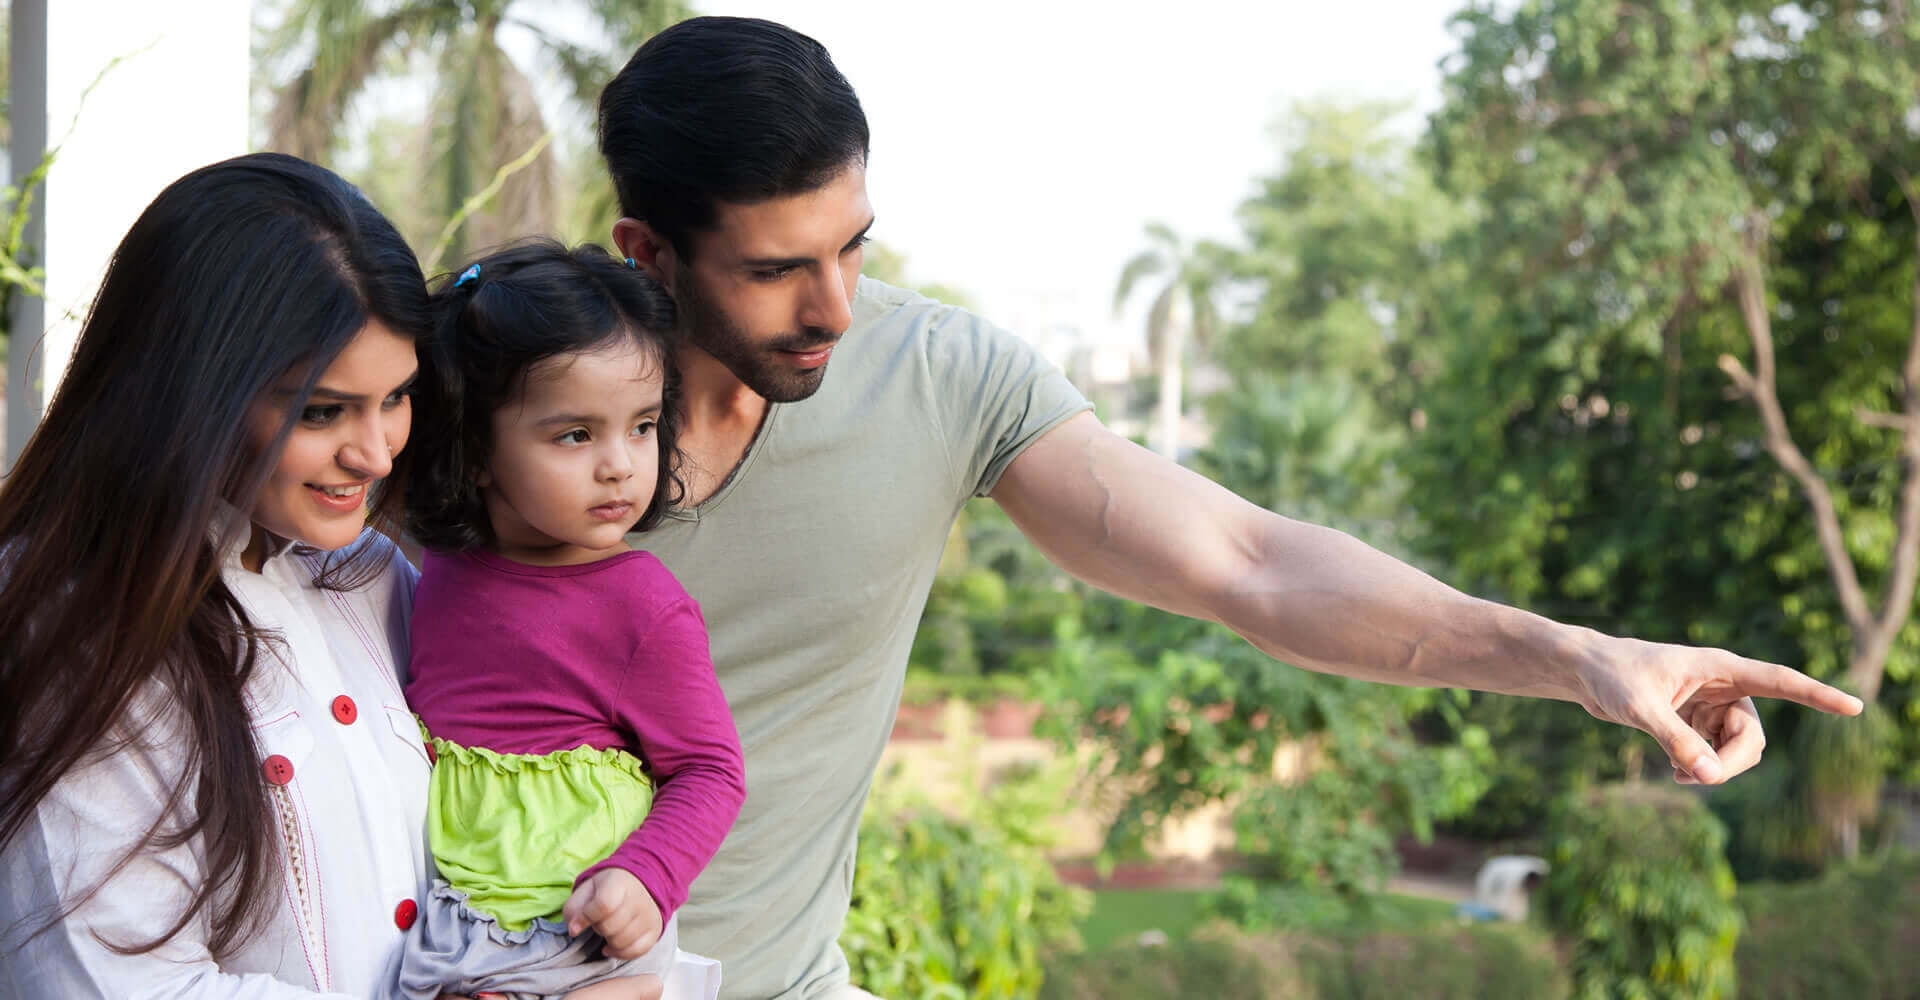 una famiglia emotivamente sana è fondamentale per crescere bambini felici